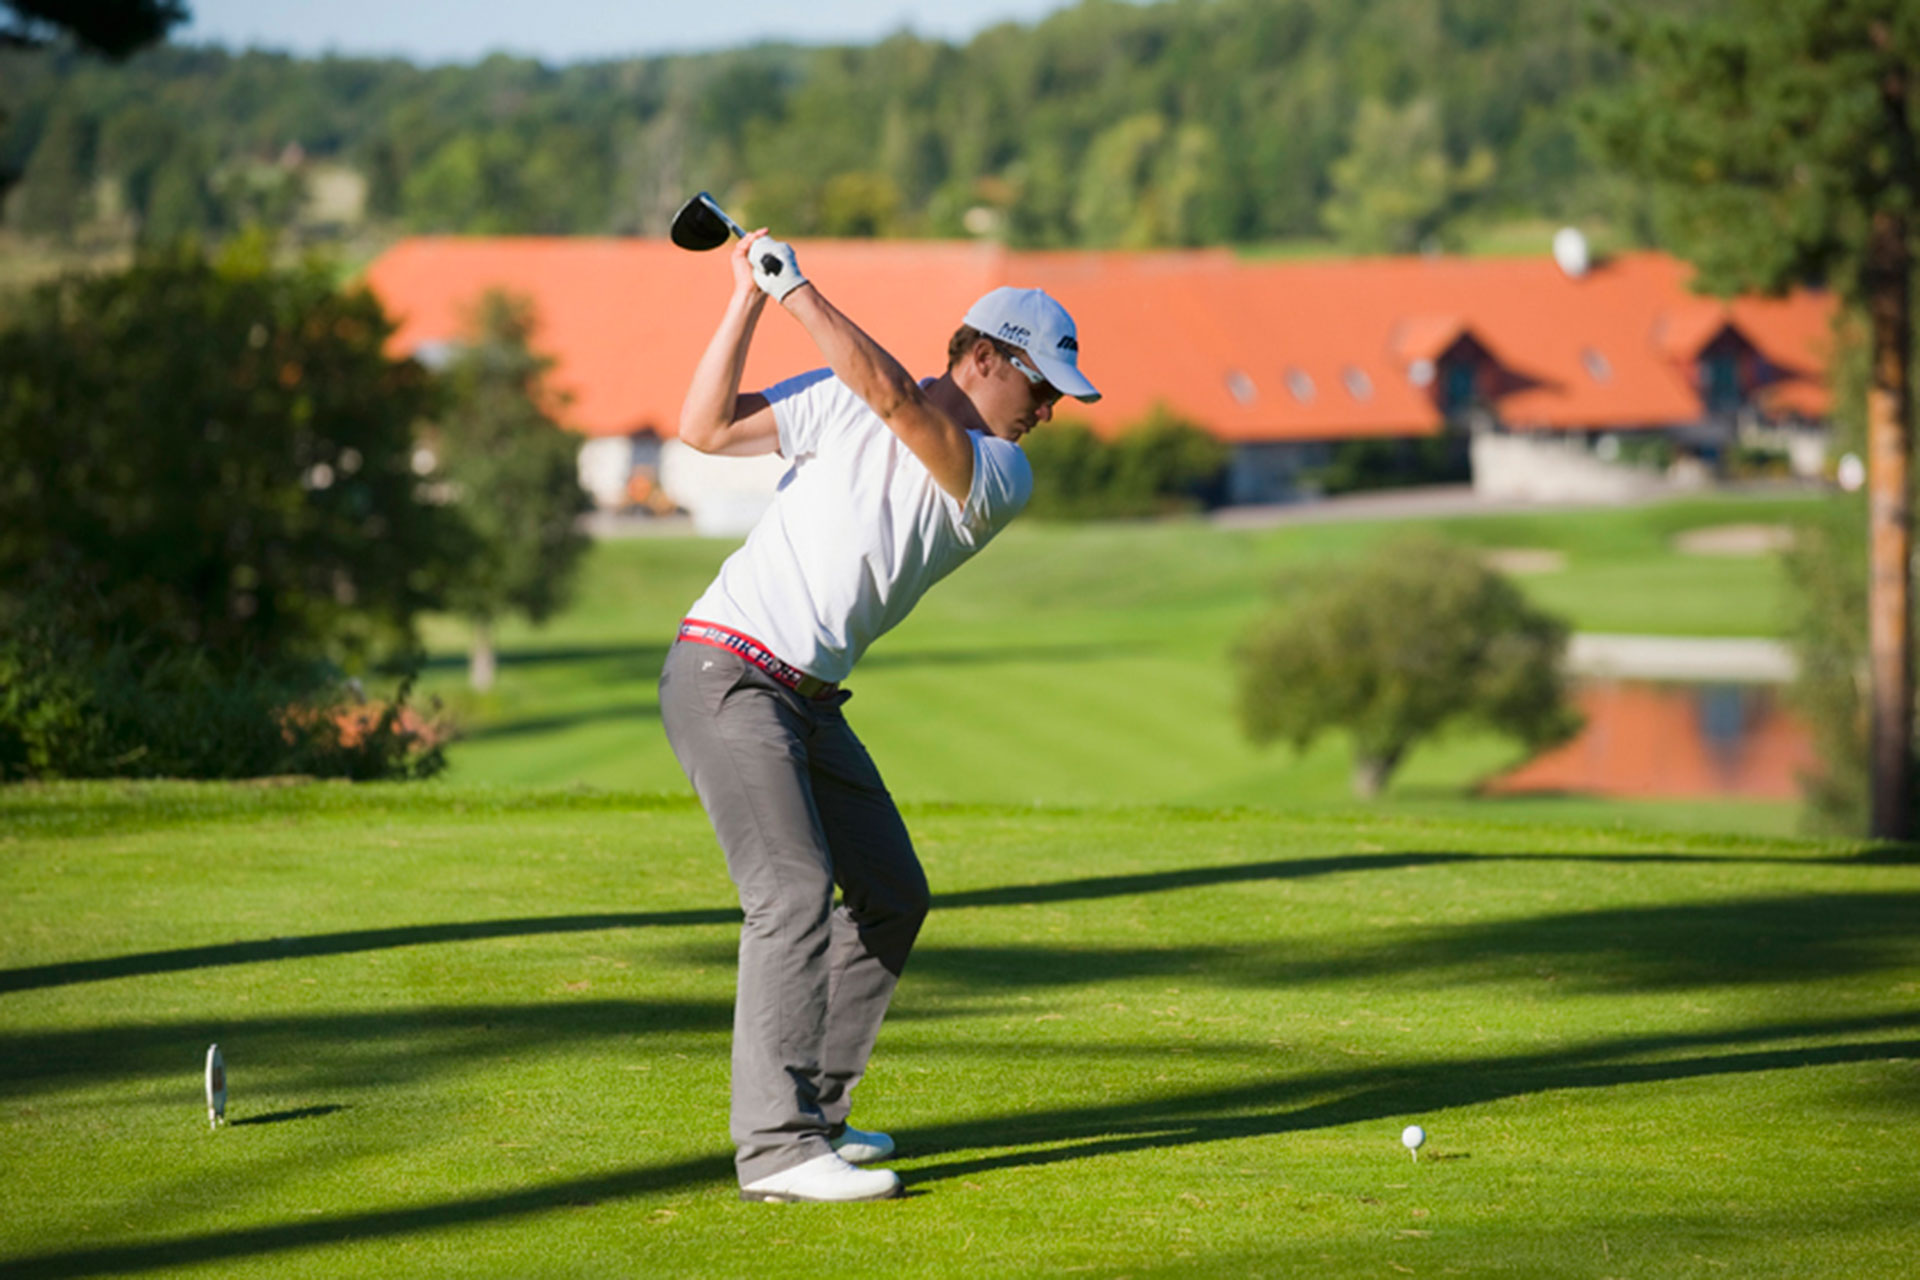 Golfare på Frösåker Golfklubb i Västerås. Fotograf: Lennart Hyse